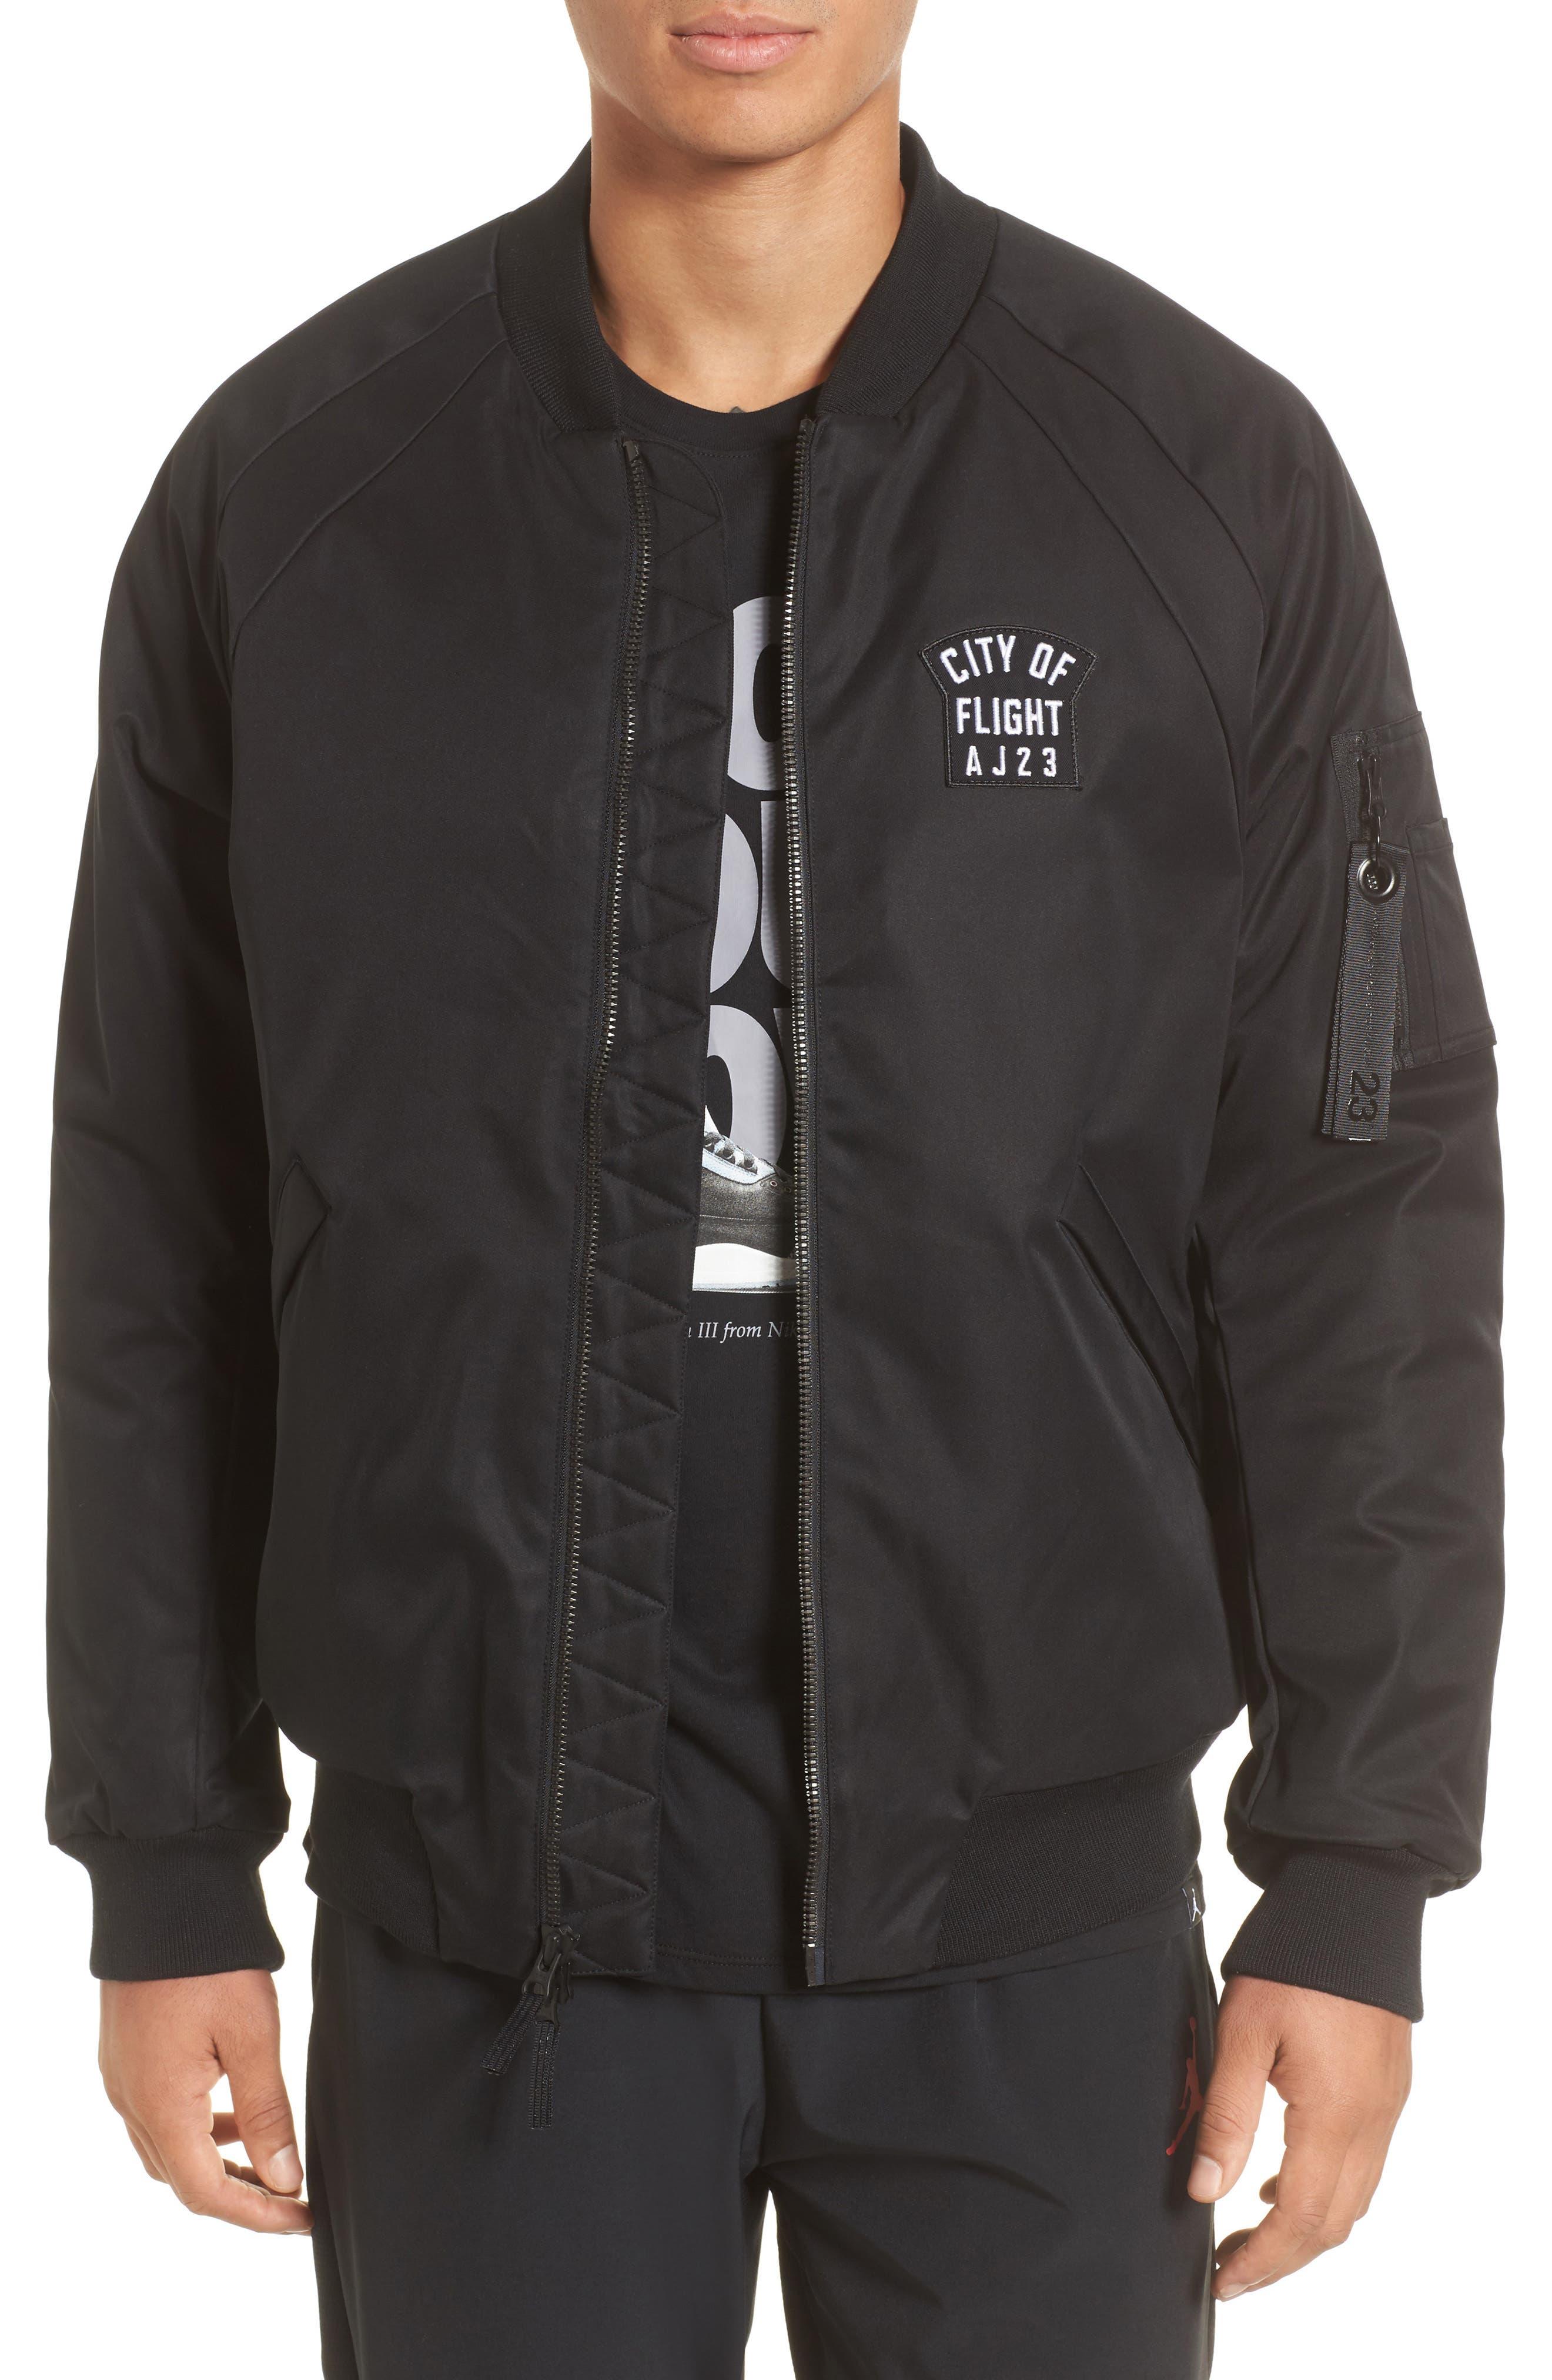 Sportswear City of Flight MA-1 Bomber Jacket,                         Main,                         color, Black